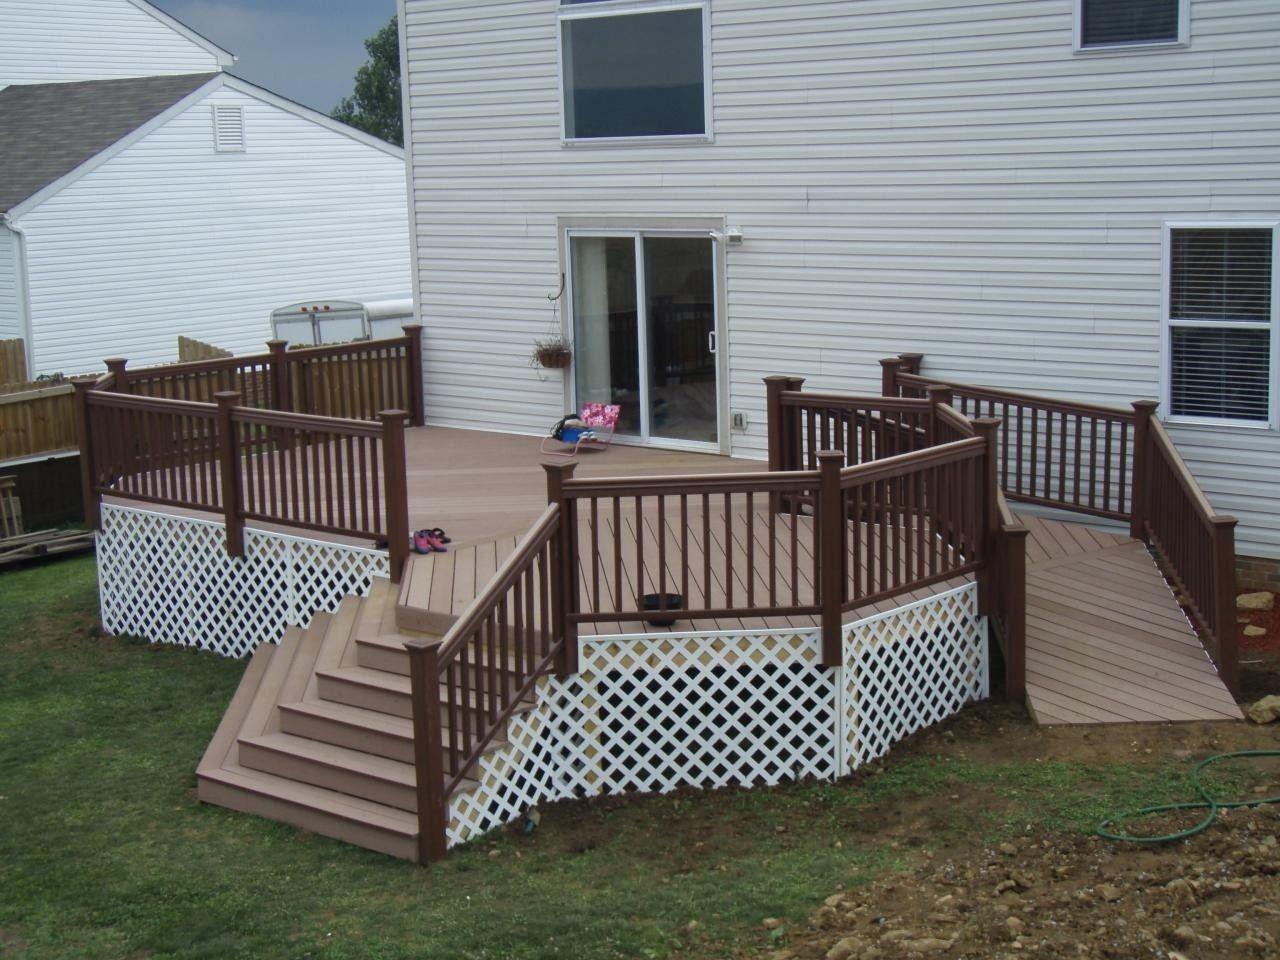 Handicap Deck Ramp Design • Decks in Backyard Deck With